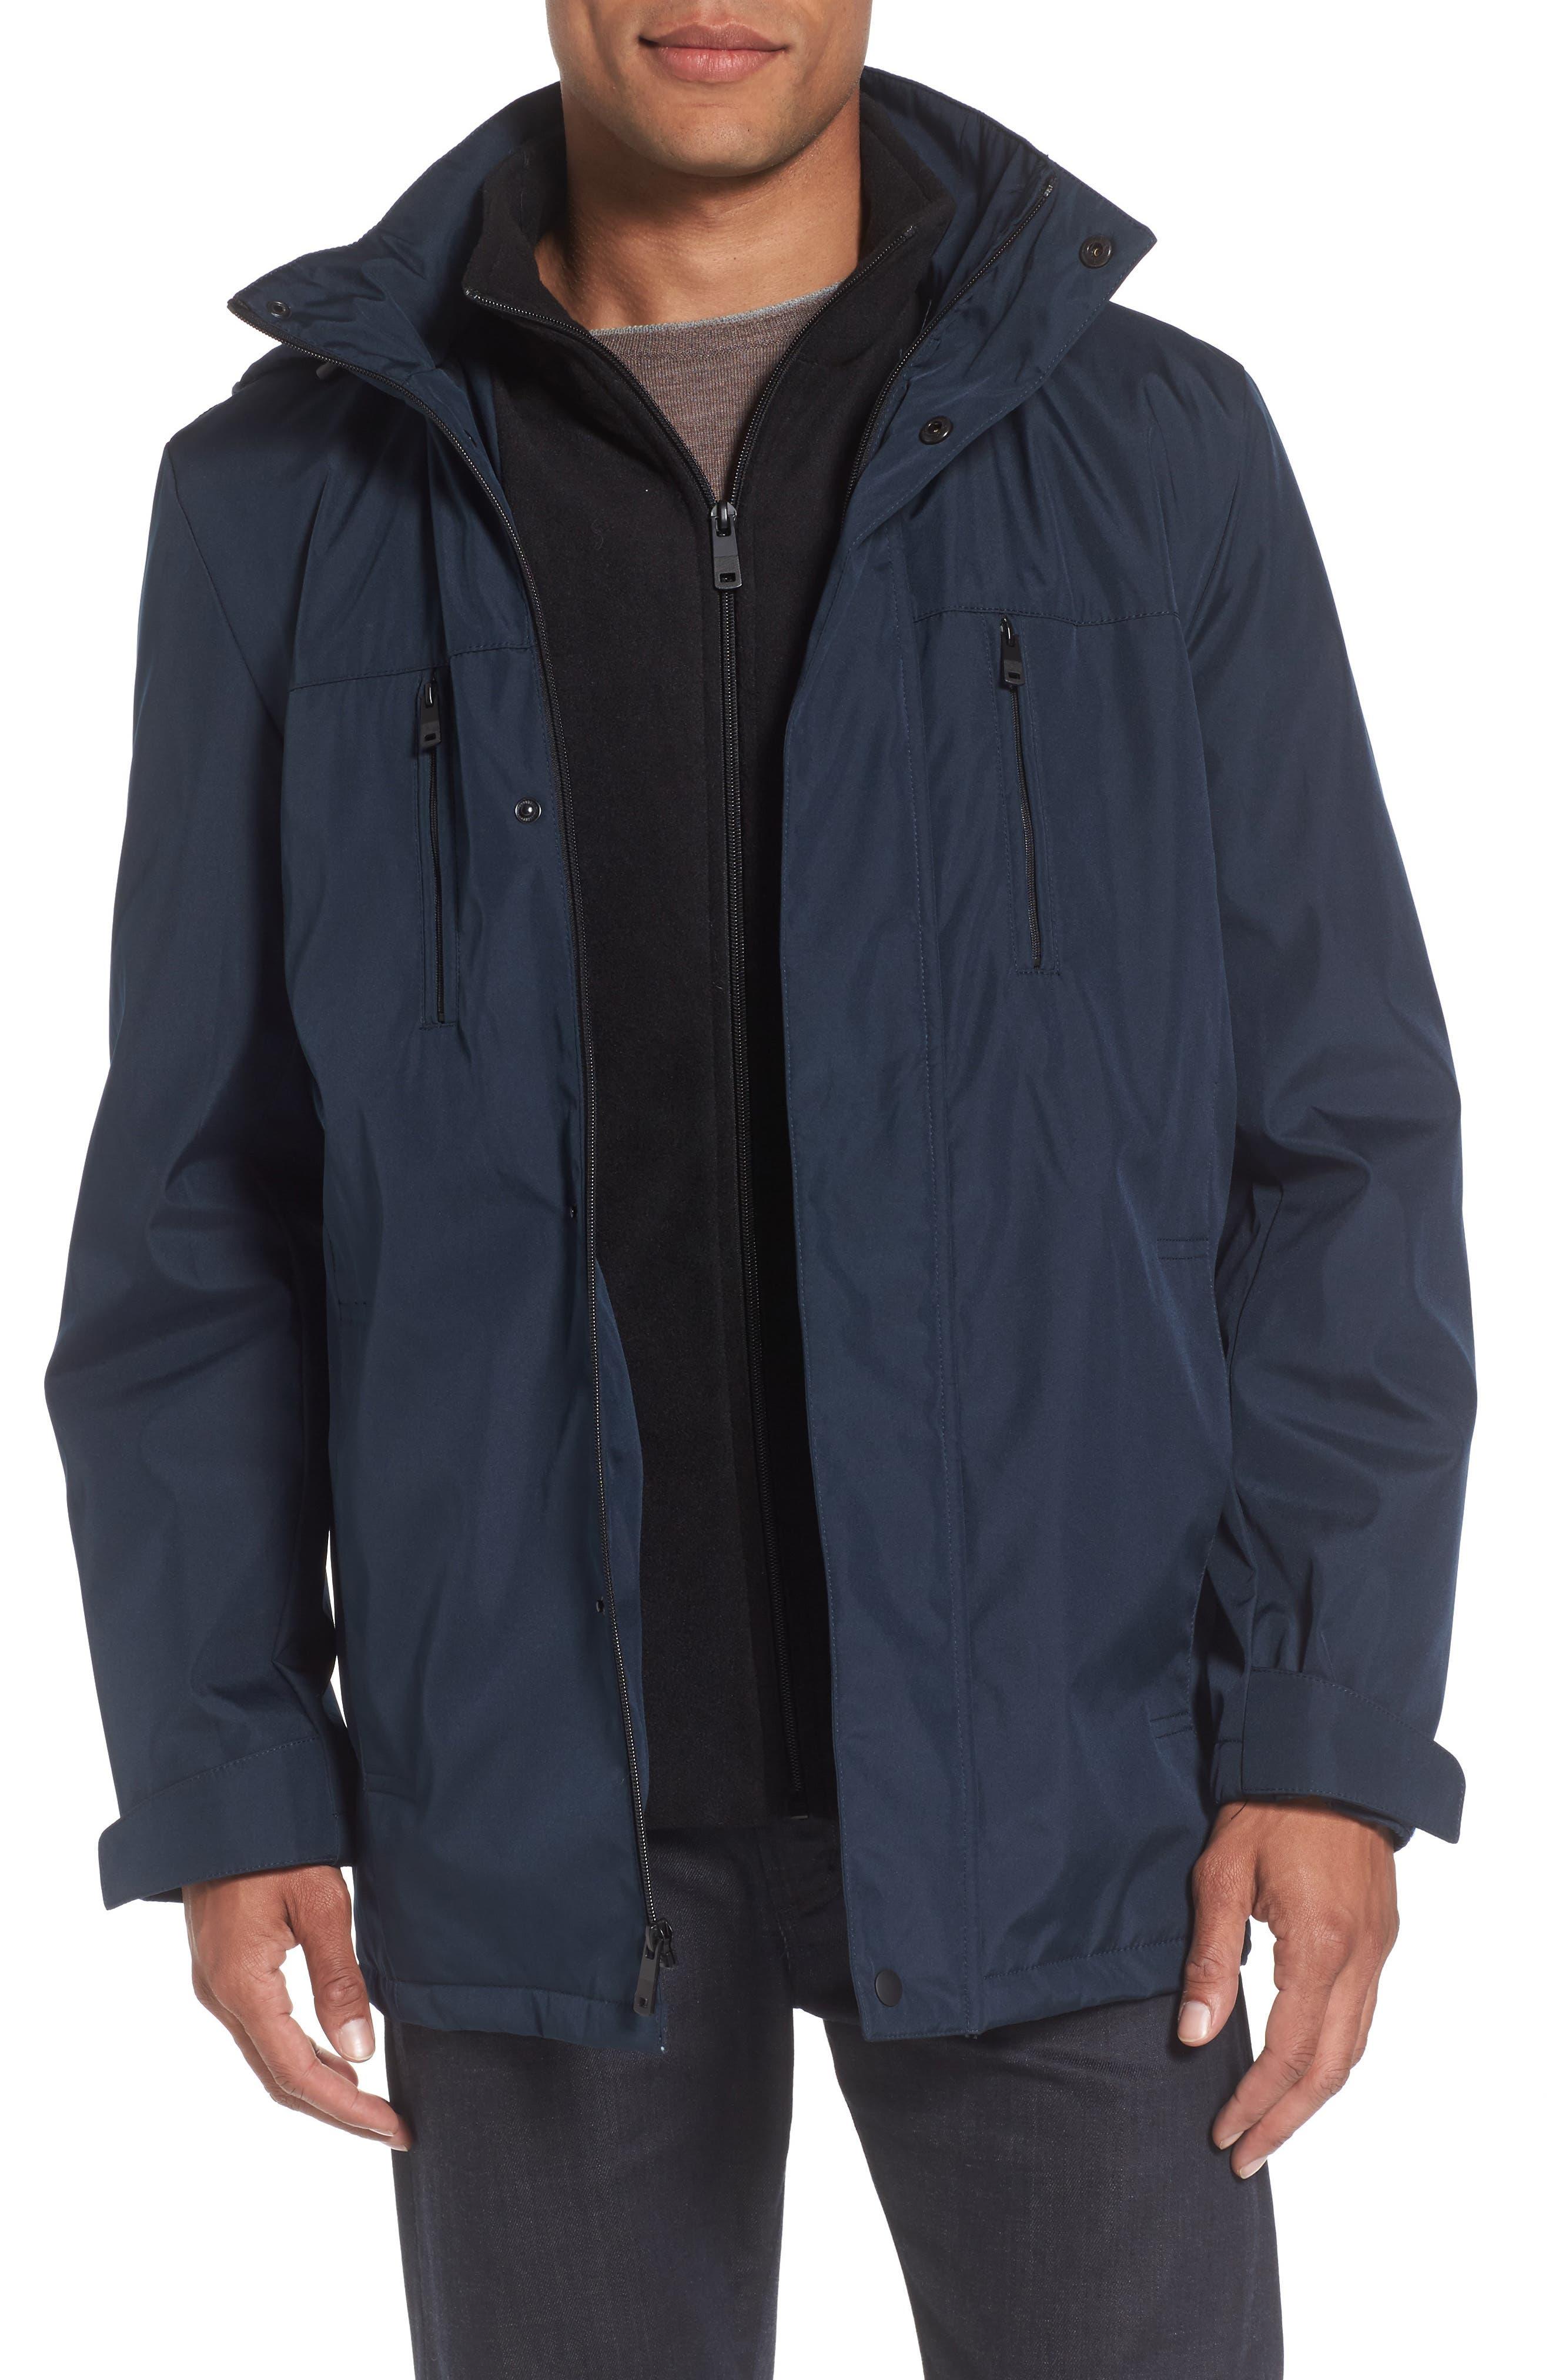 Hooded Jacket with Inset Fleece Bib,                             Main thumbnail 4, color,